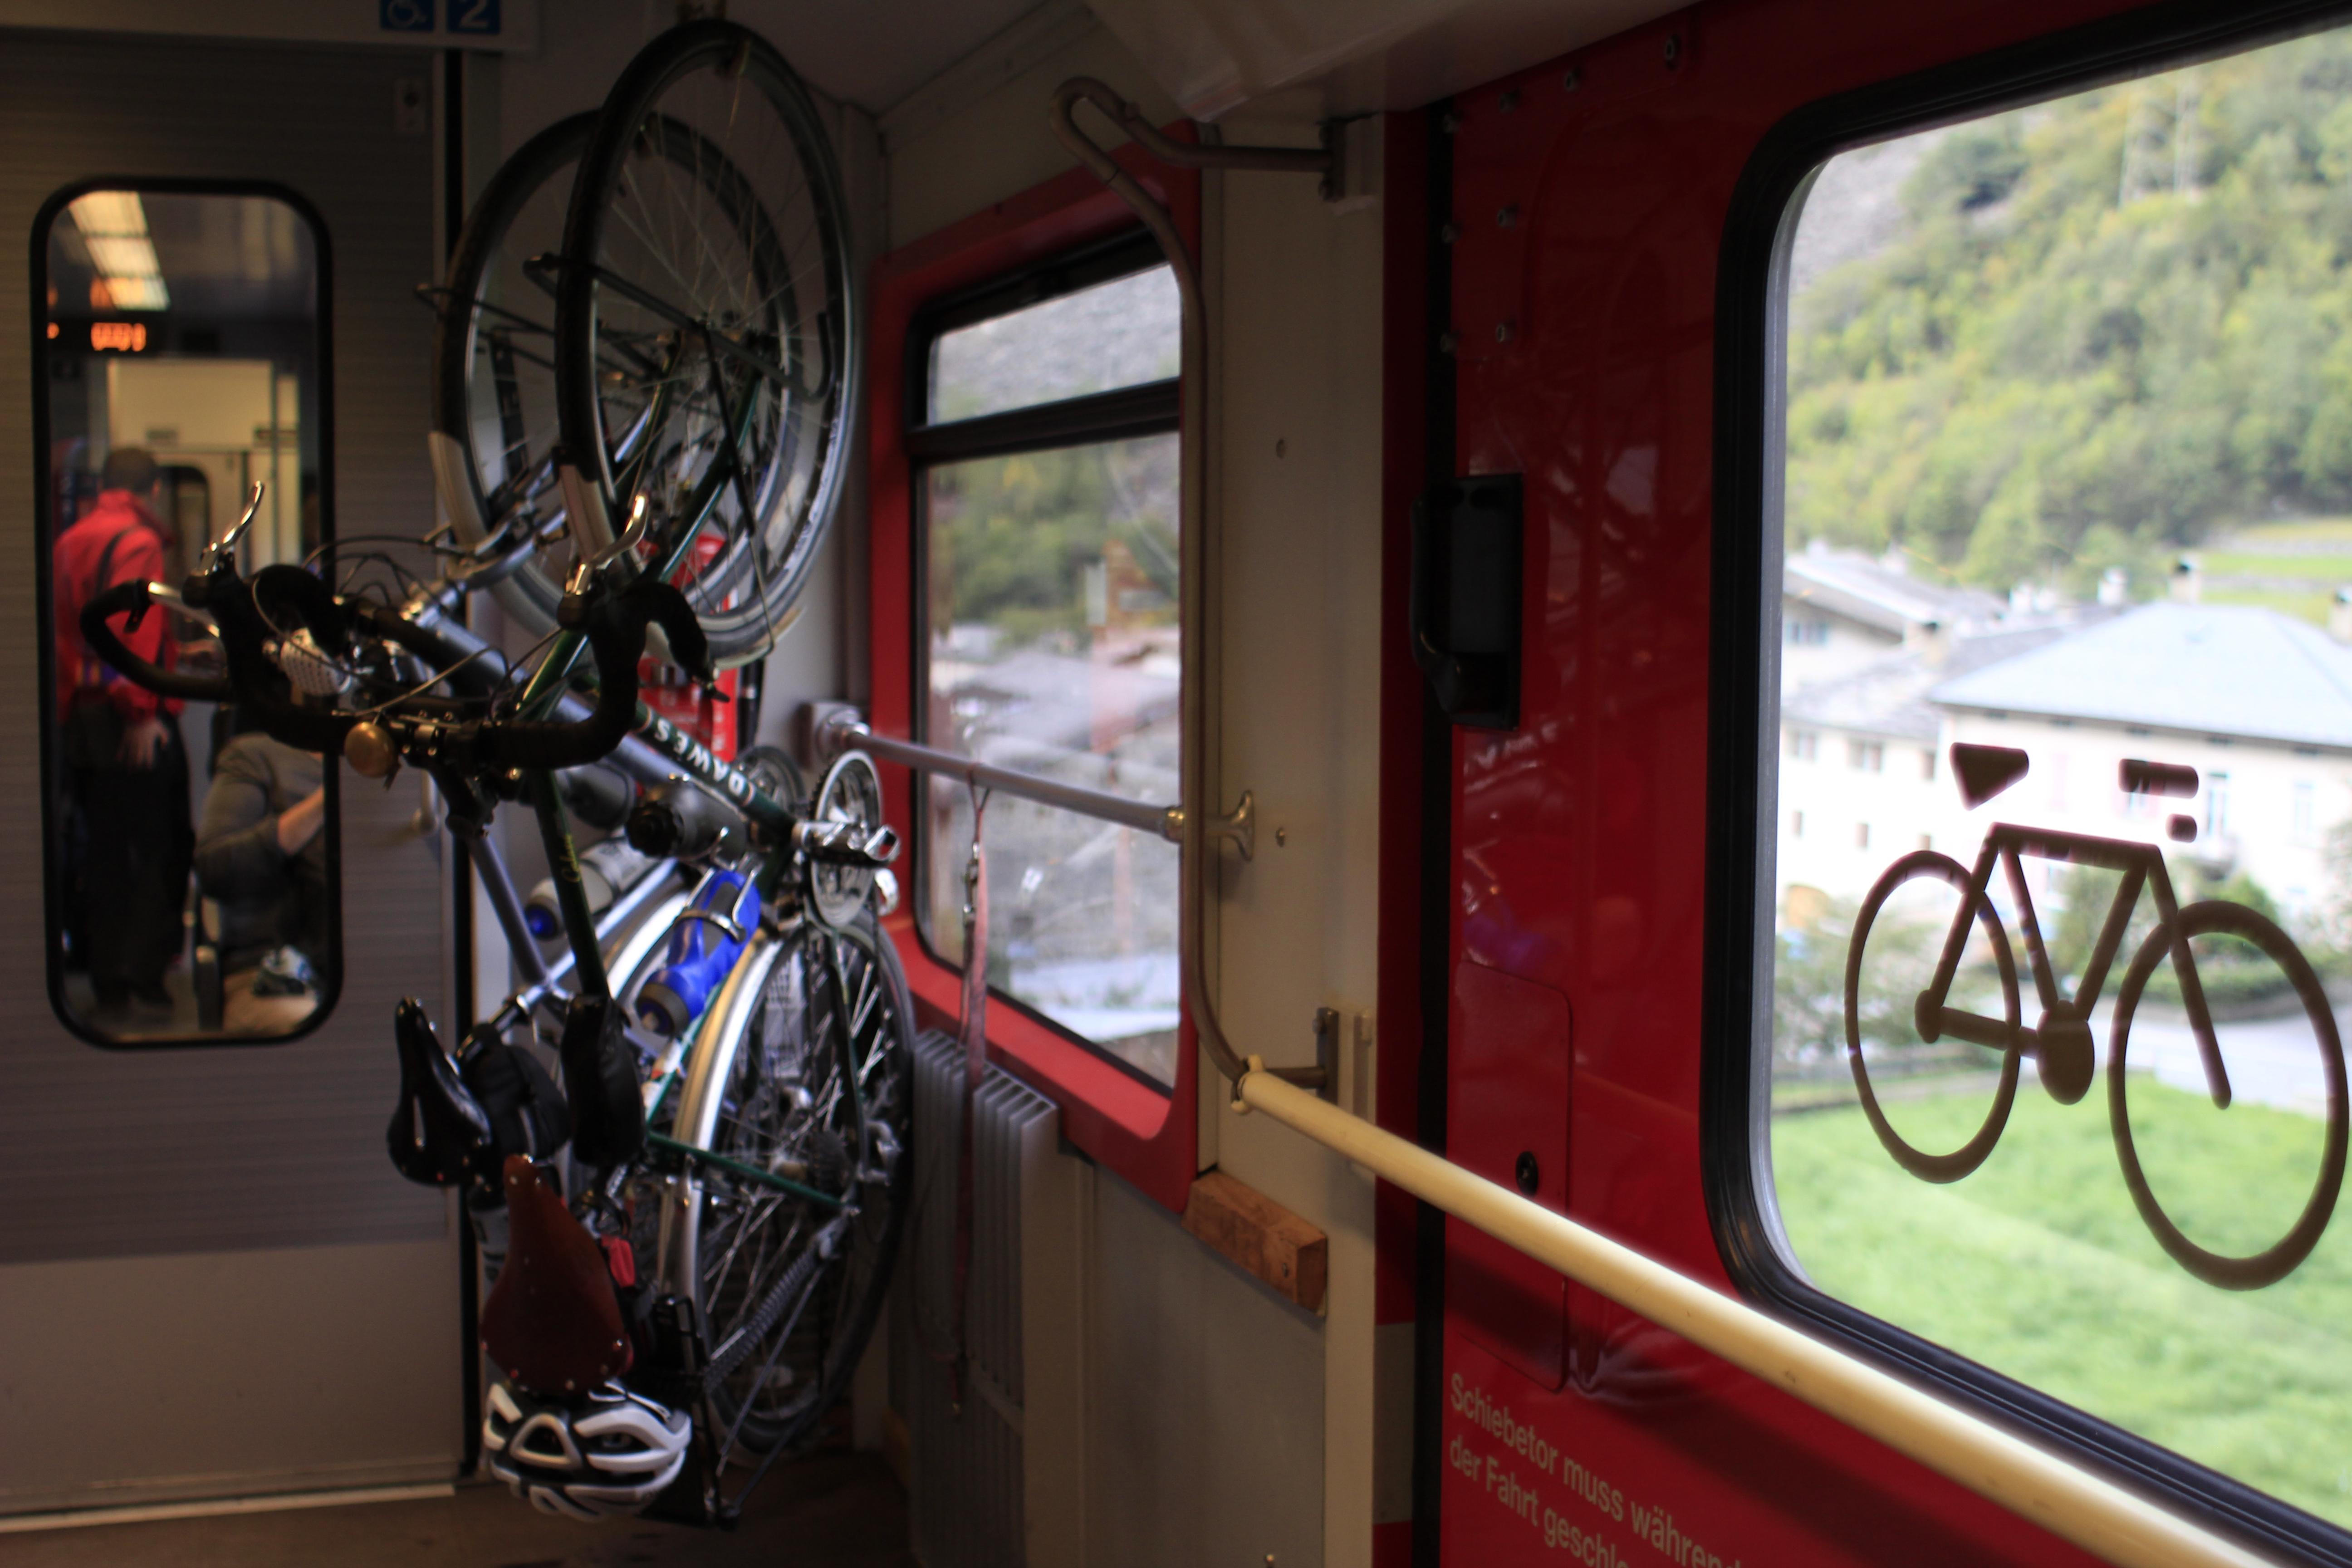 Treno rosso del Bernina ph. Francesco Rasero per eHabitat